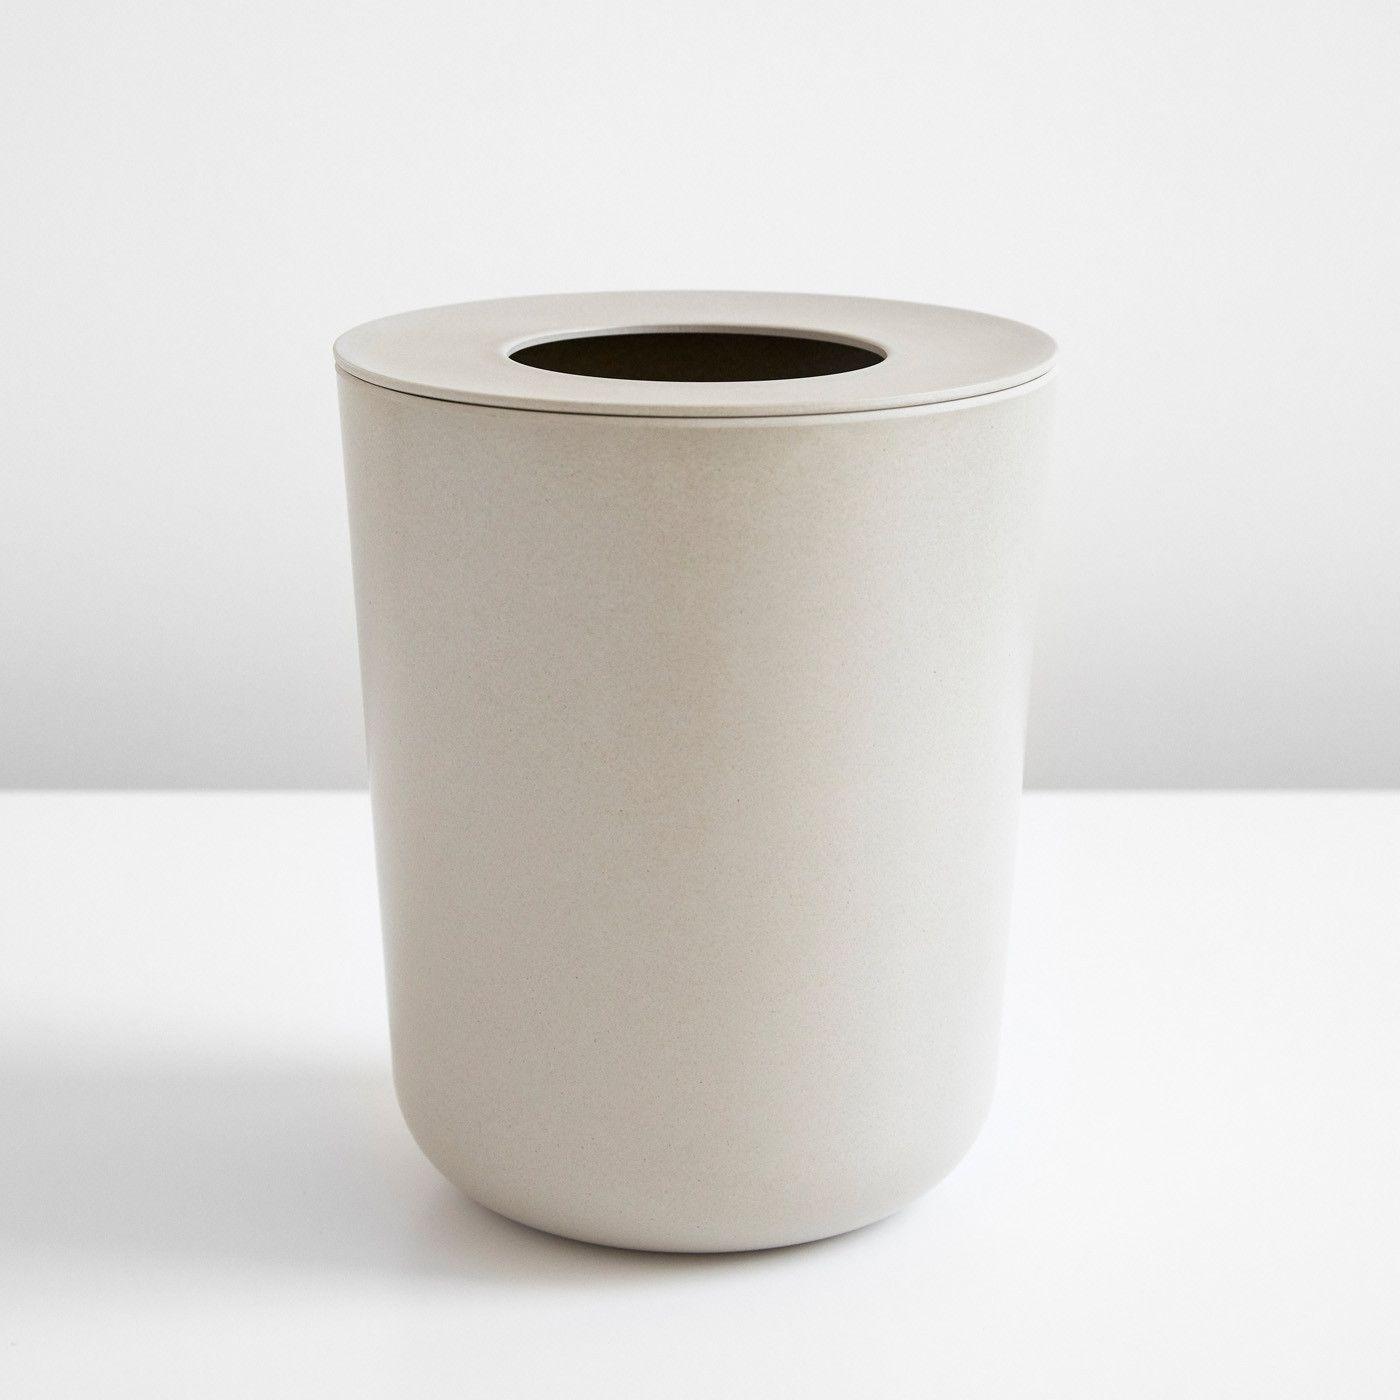 Ekobo Stone Waste Bin Bathroom, Modern Bathroom Wastebasket